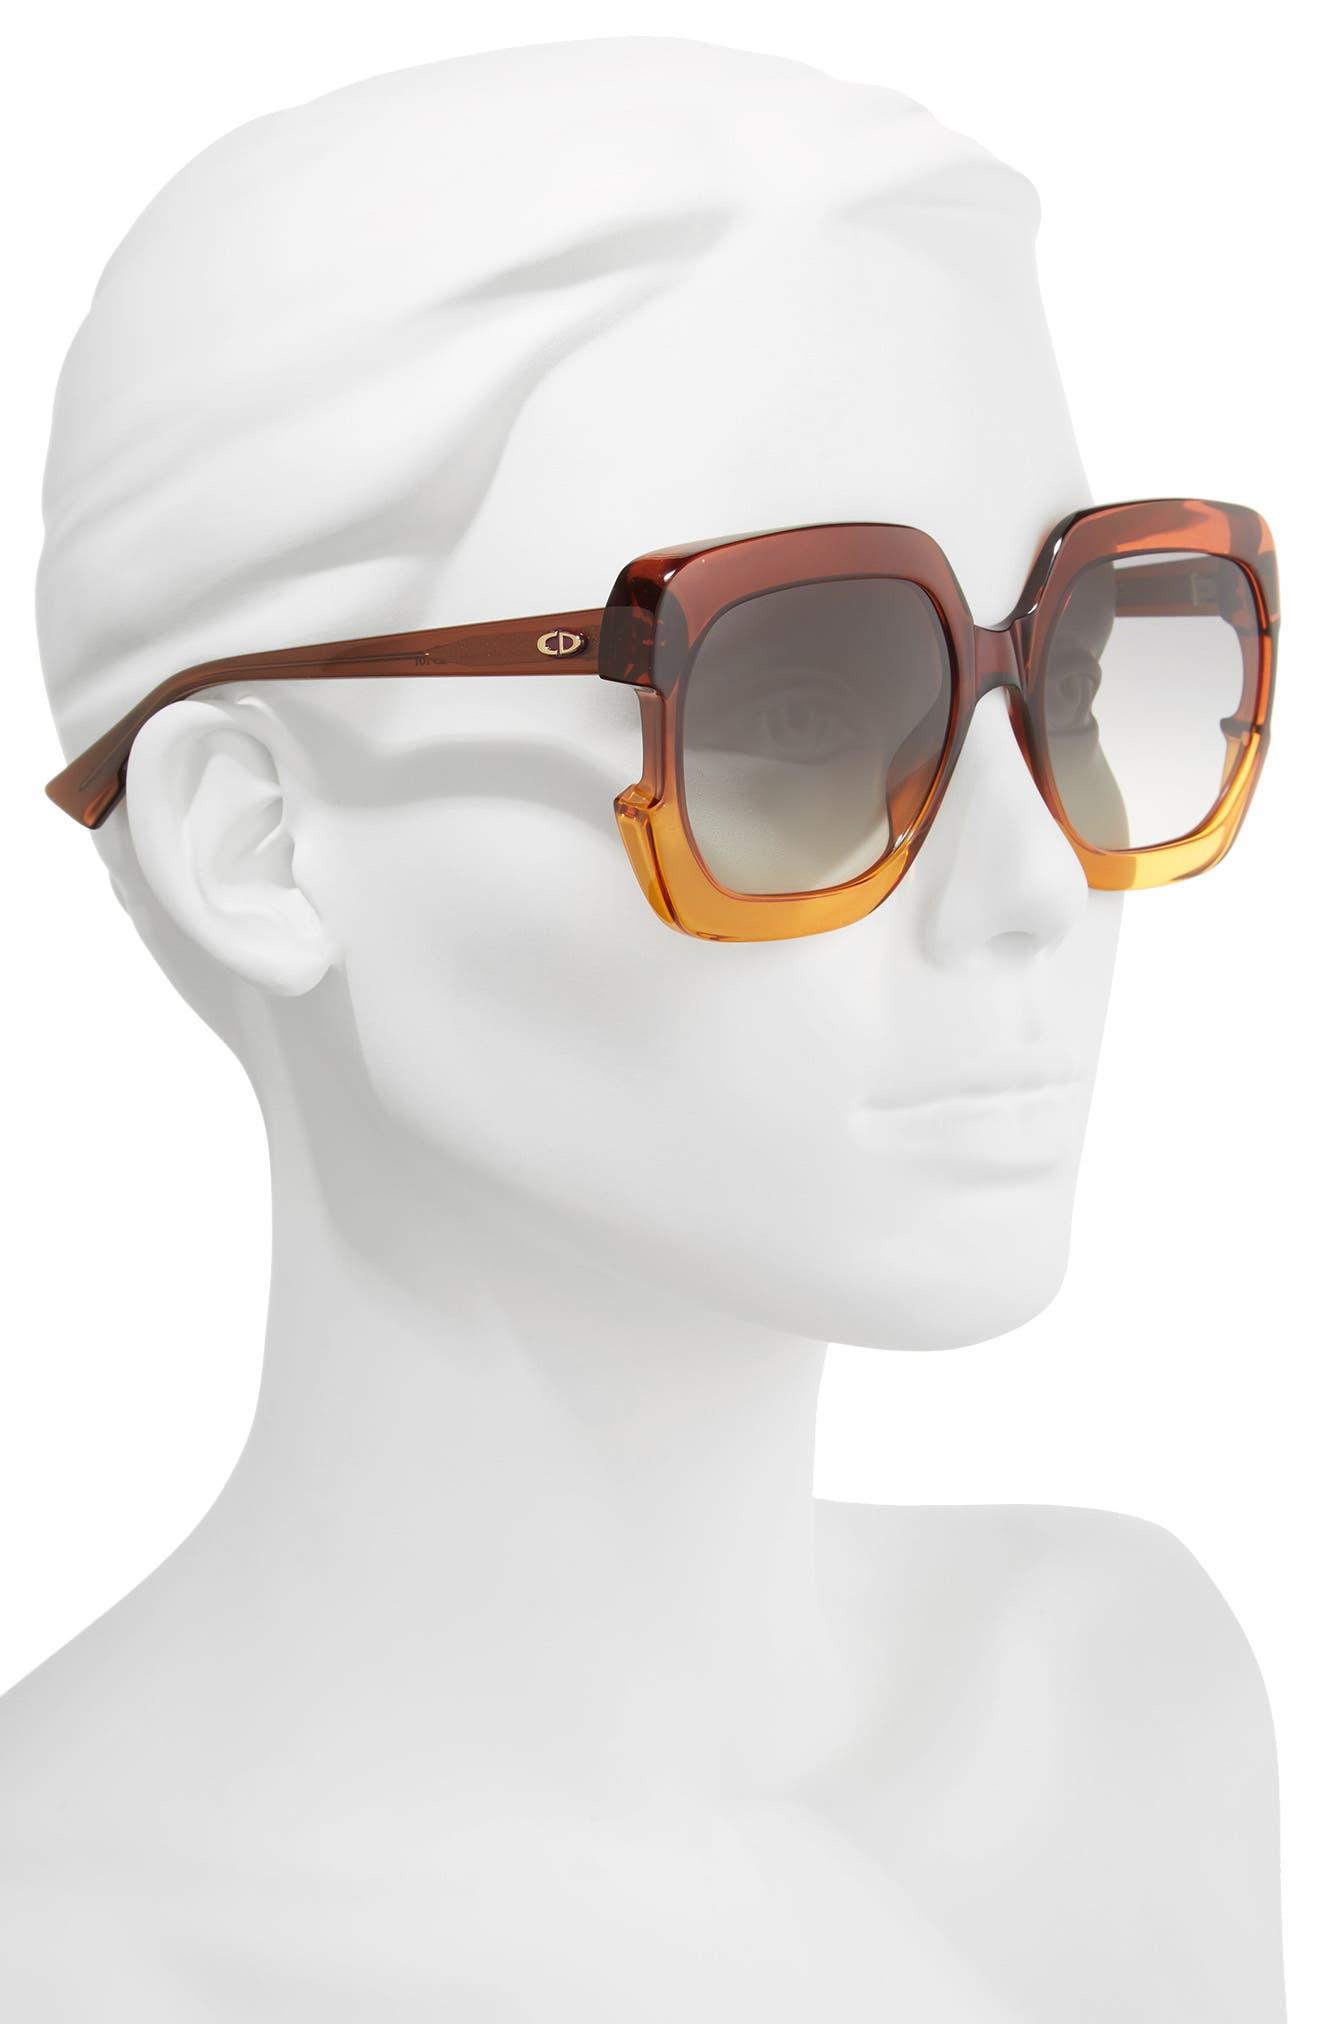 Gaia 58mm Square Sunglasses,                             Alternate thumbnail 2, color,                             Brown/ Orange